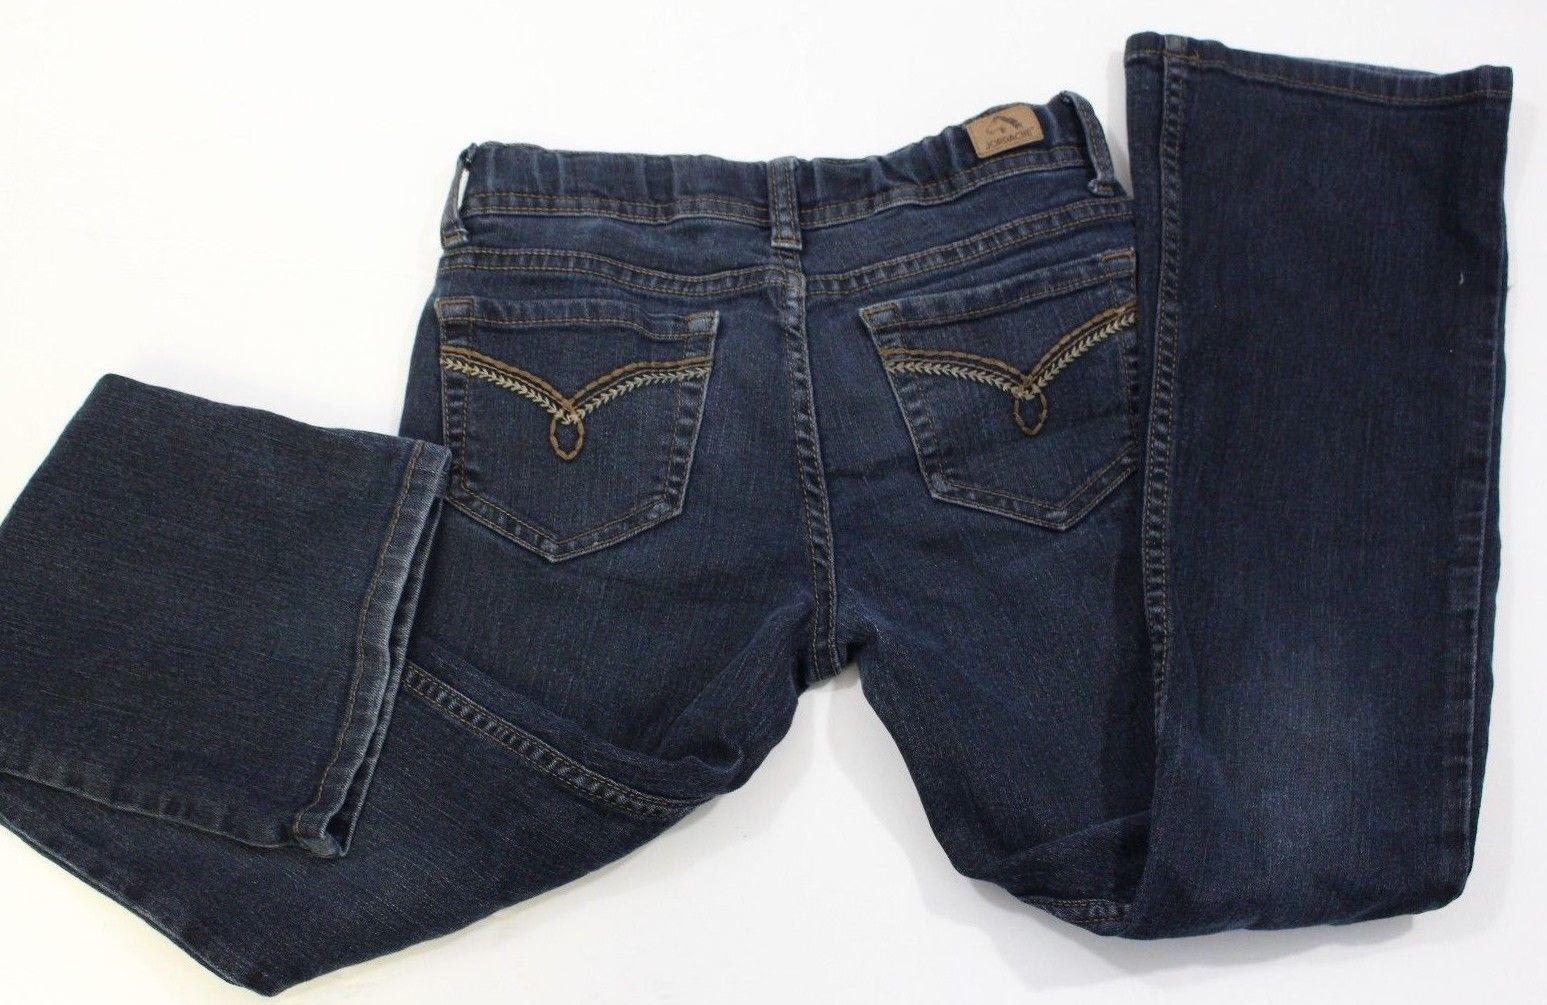 73e2eba07ee Jordache Girls Jeans Blue Size 8 Adjustable and 46 similar items